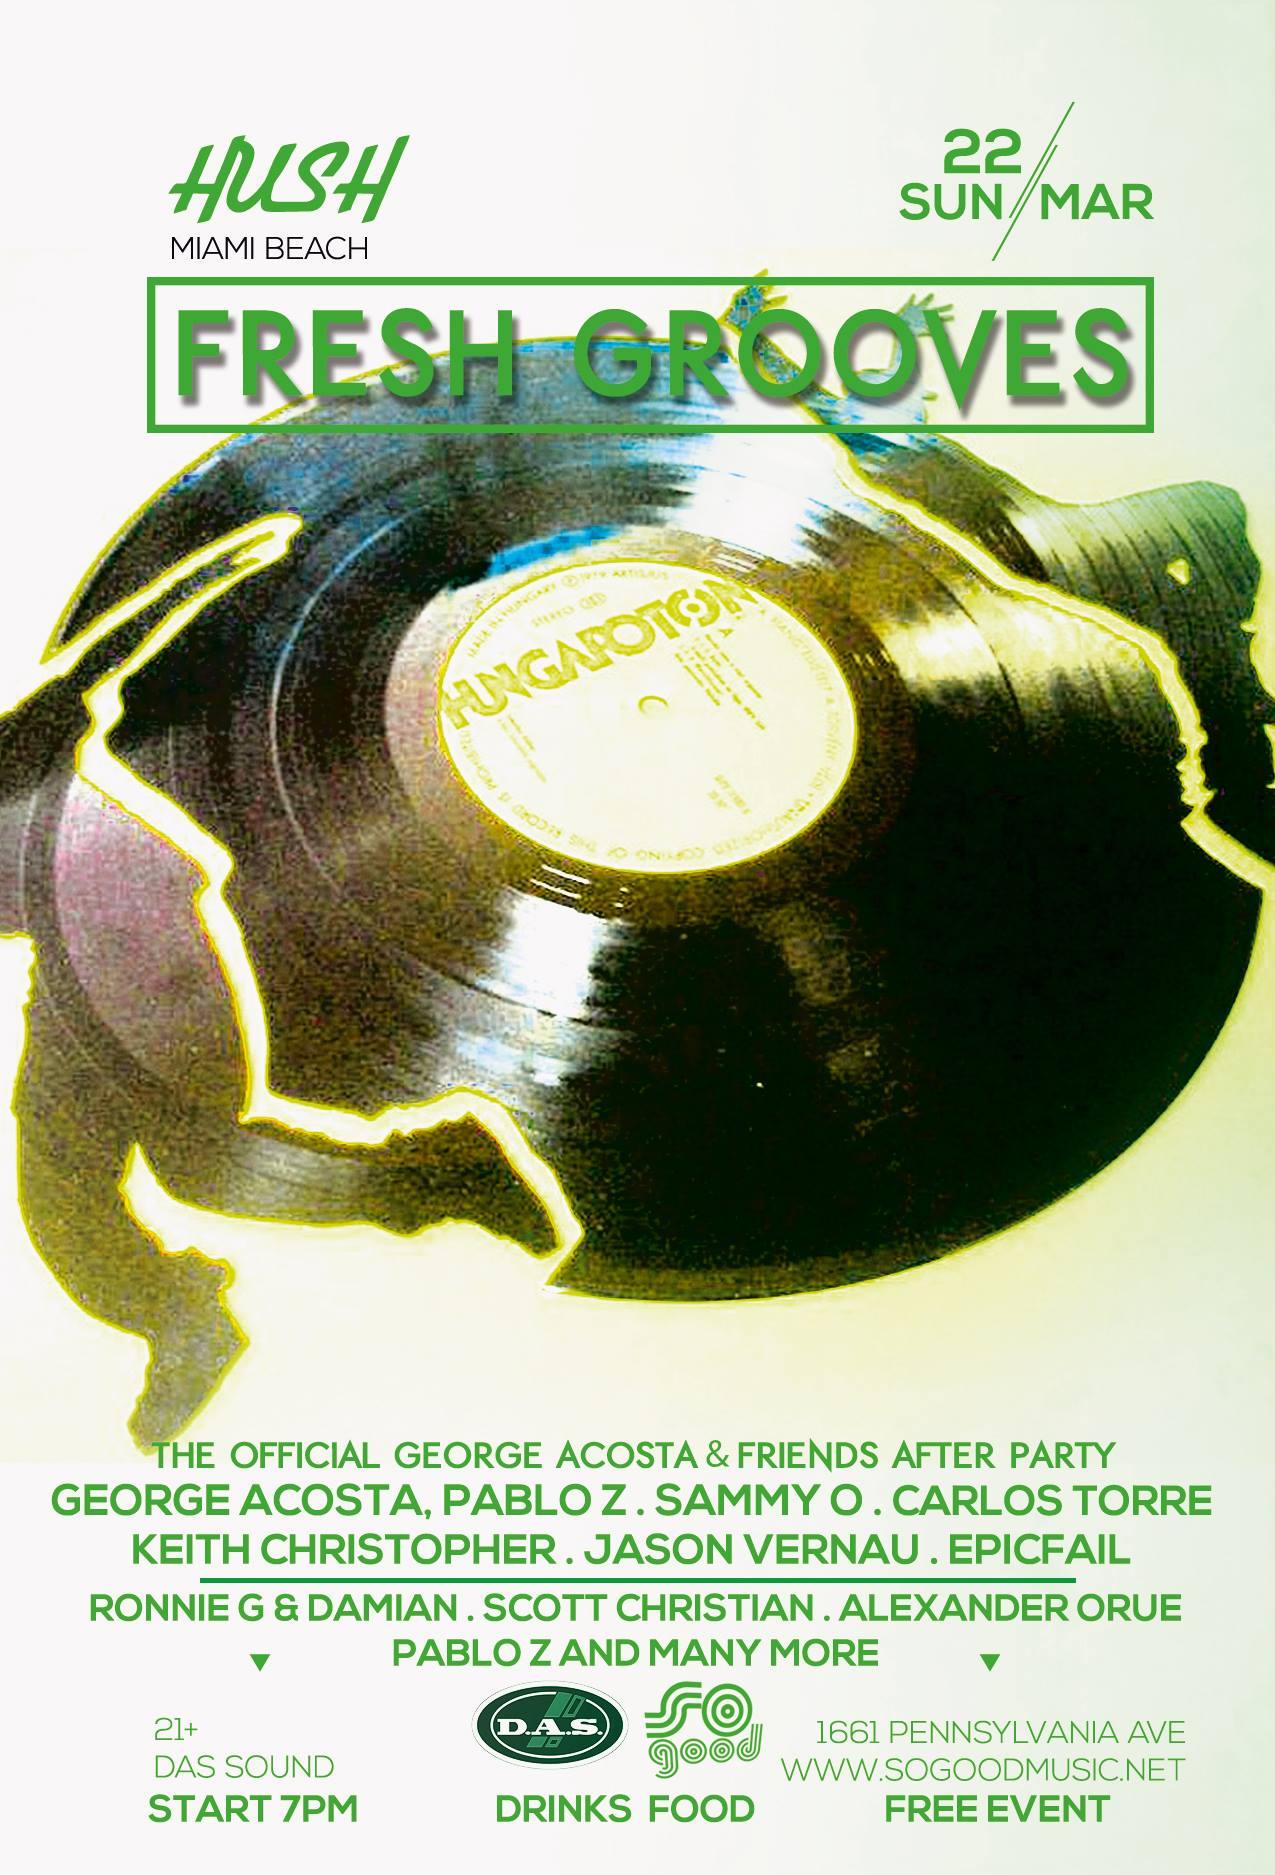 Hush Fresh Grooves WMC 2015